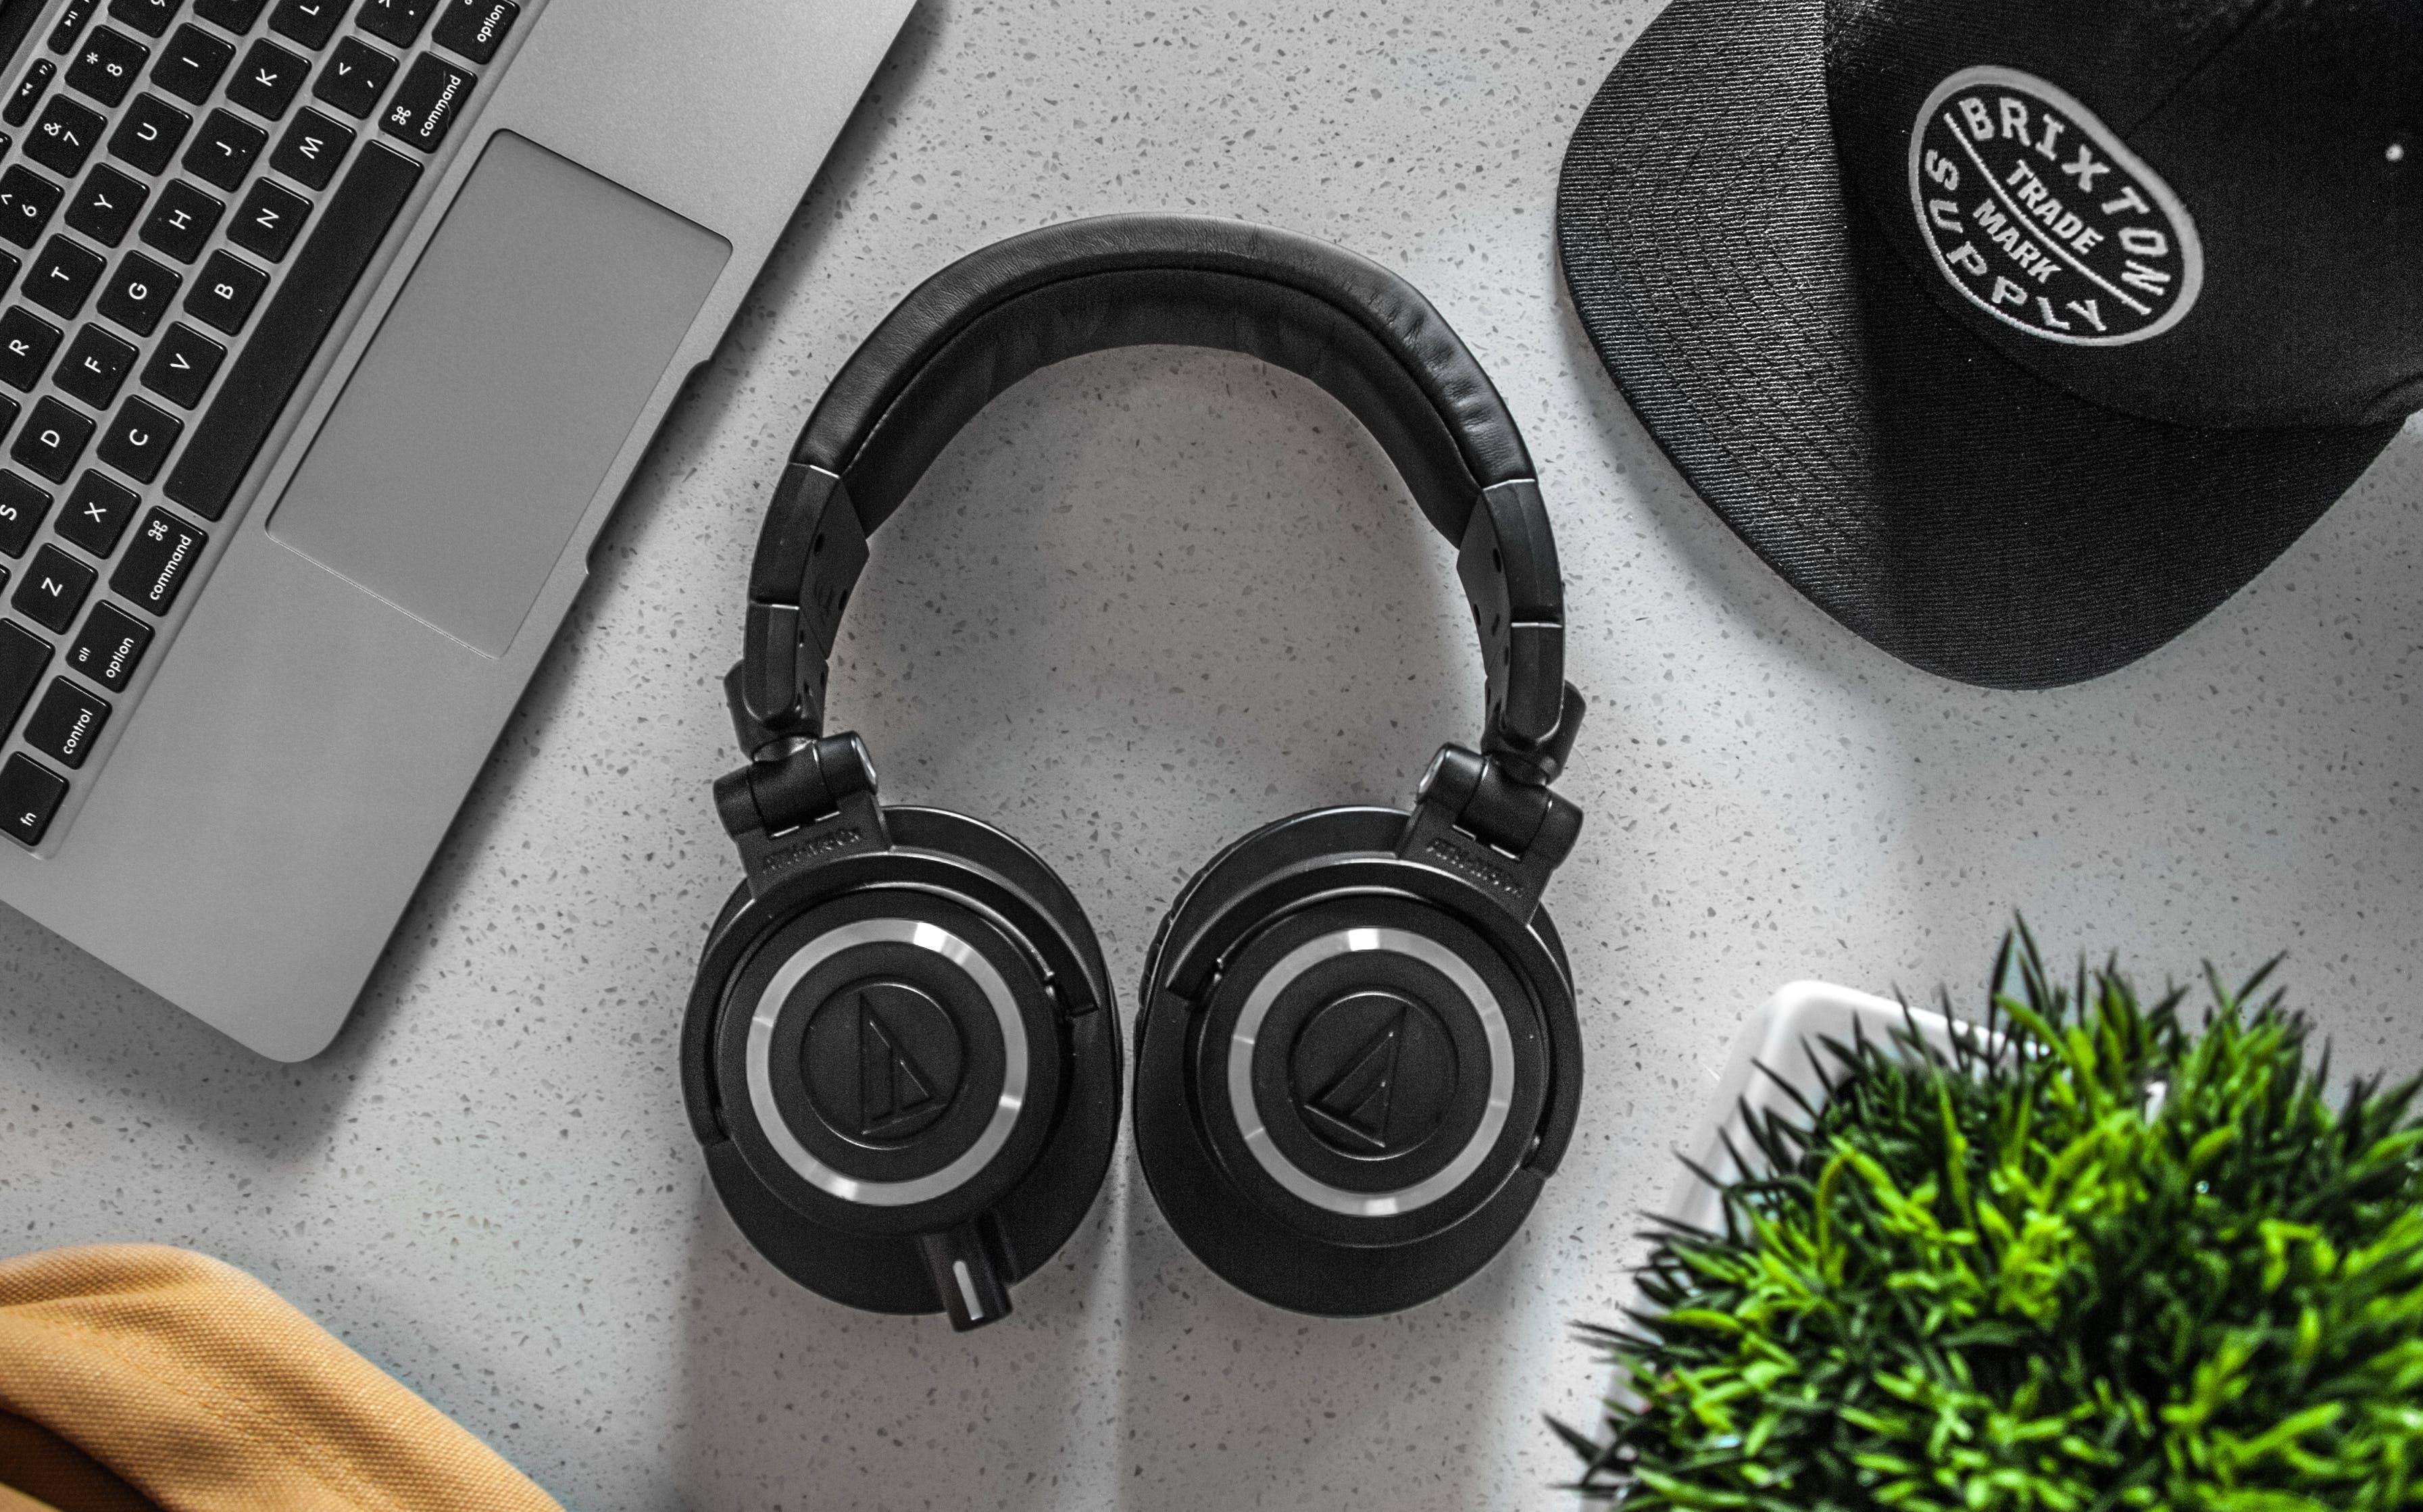 Black Wireless Headphones On White Table